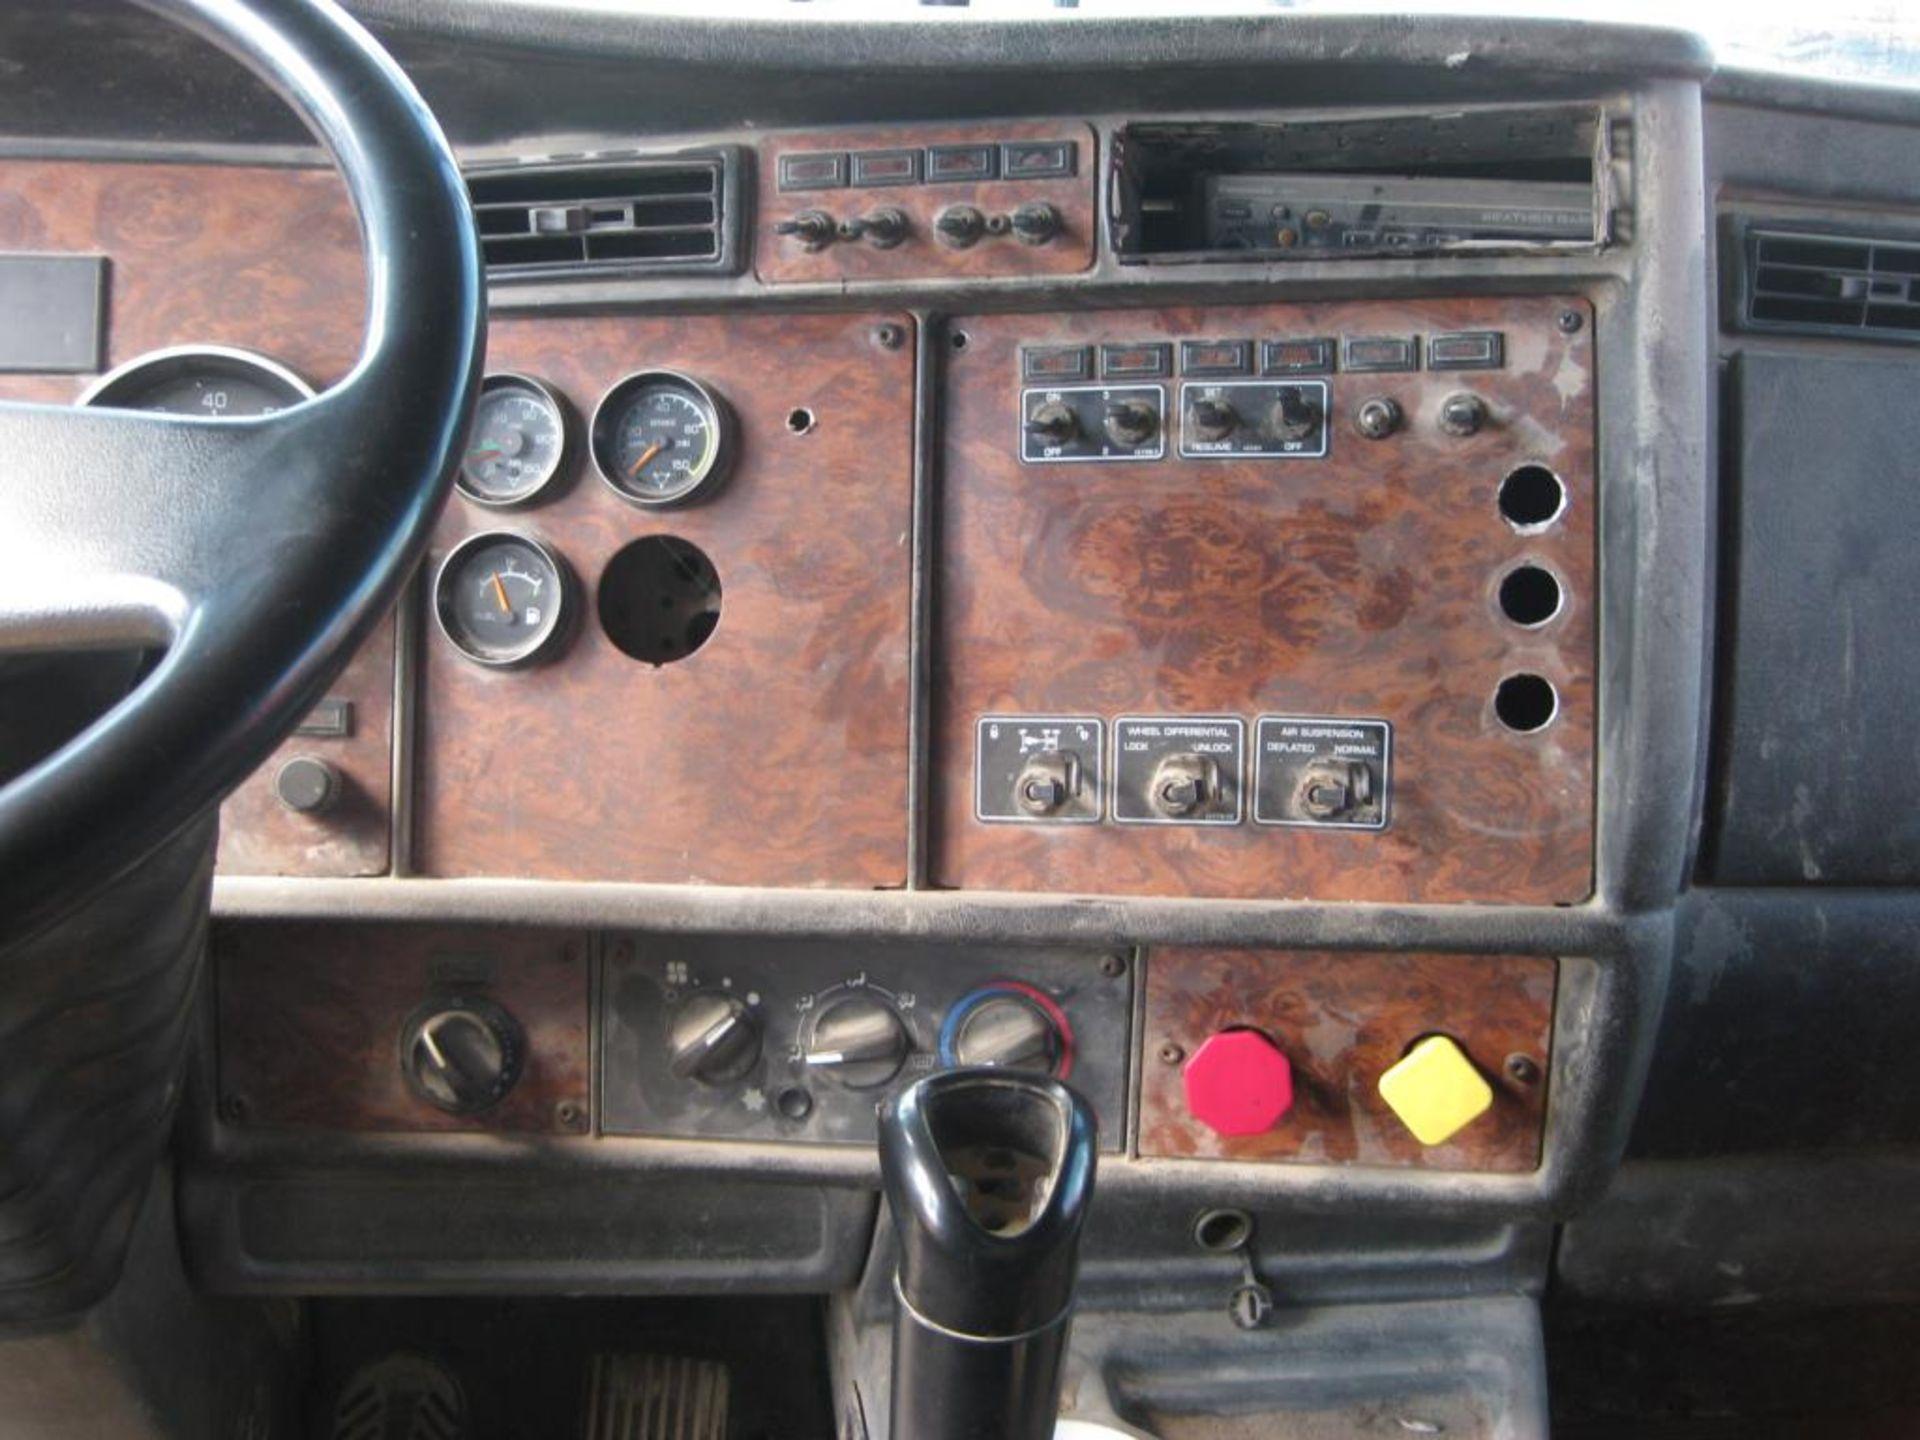 Kenworth Truck - Image 13 of 21